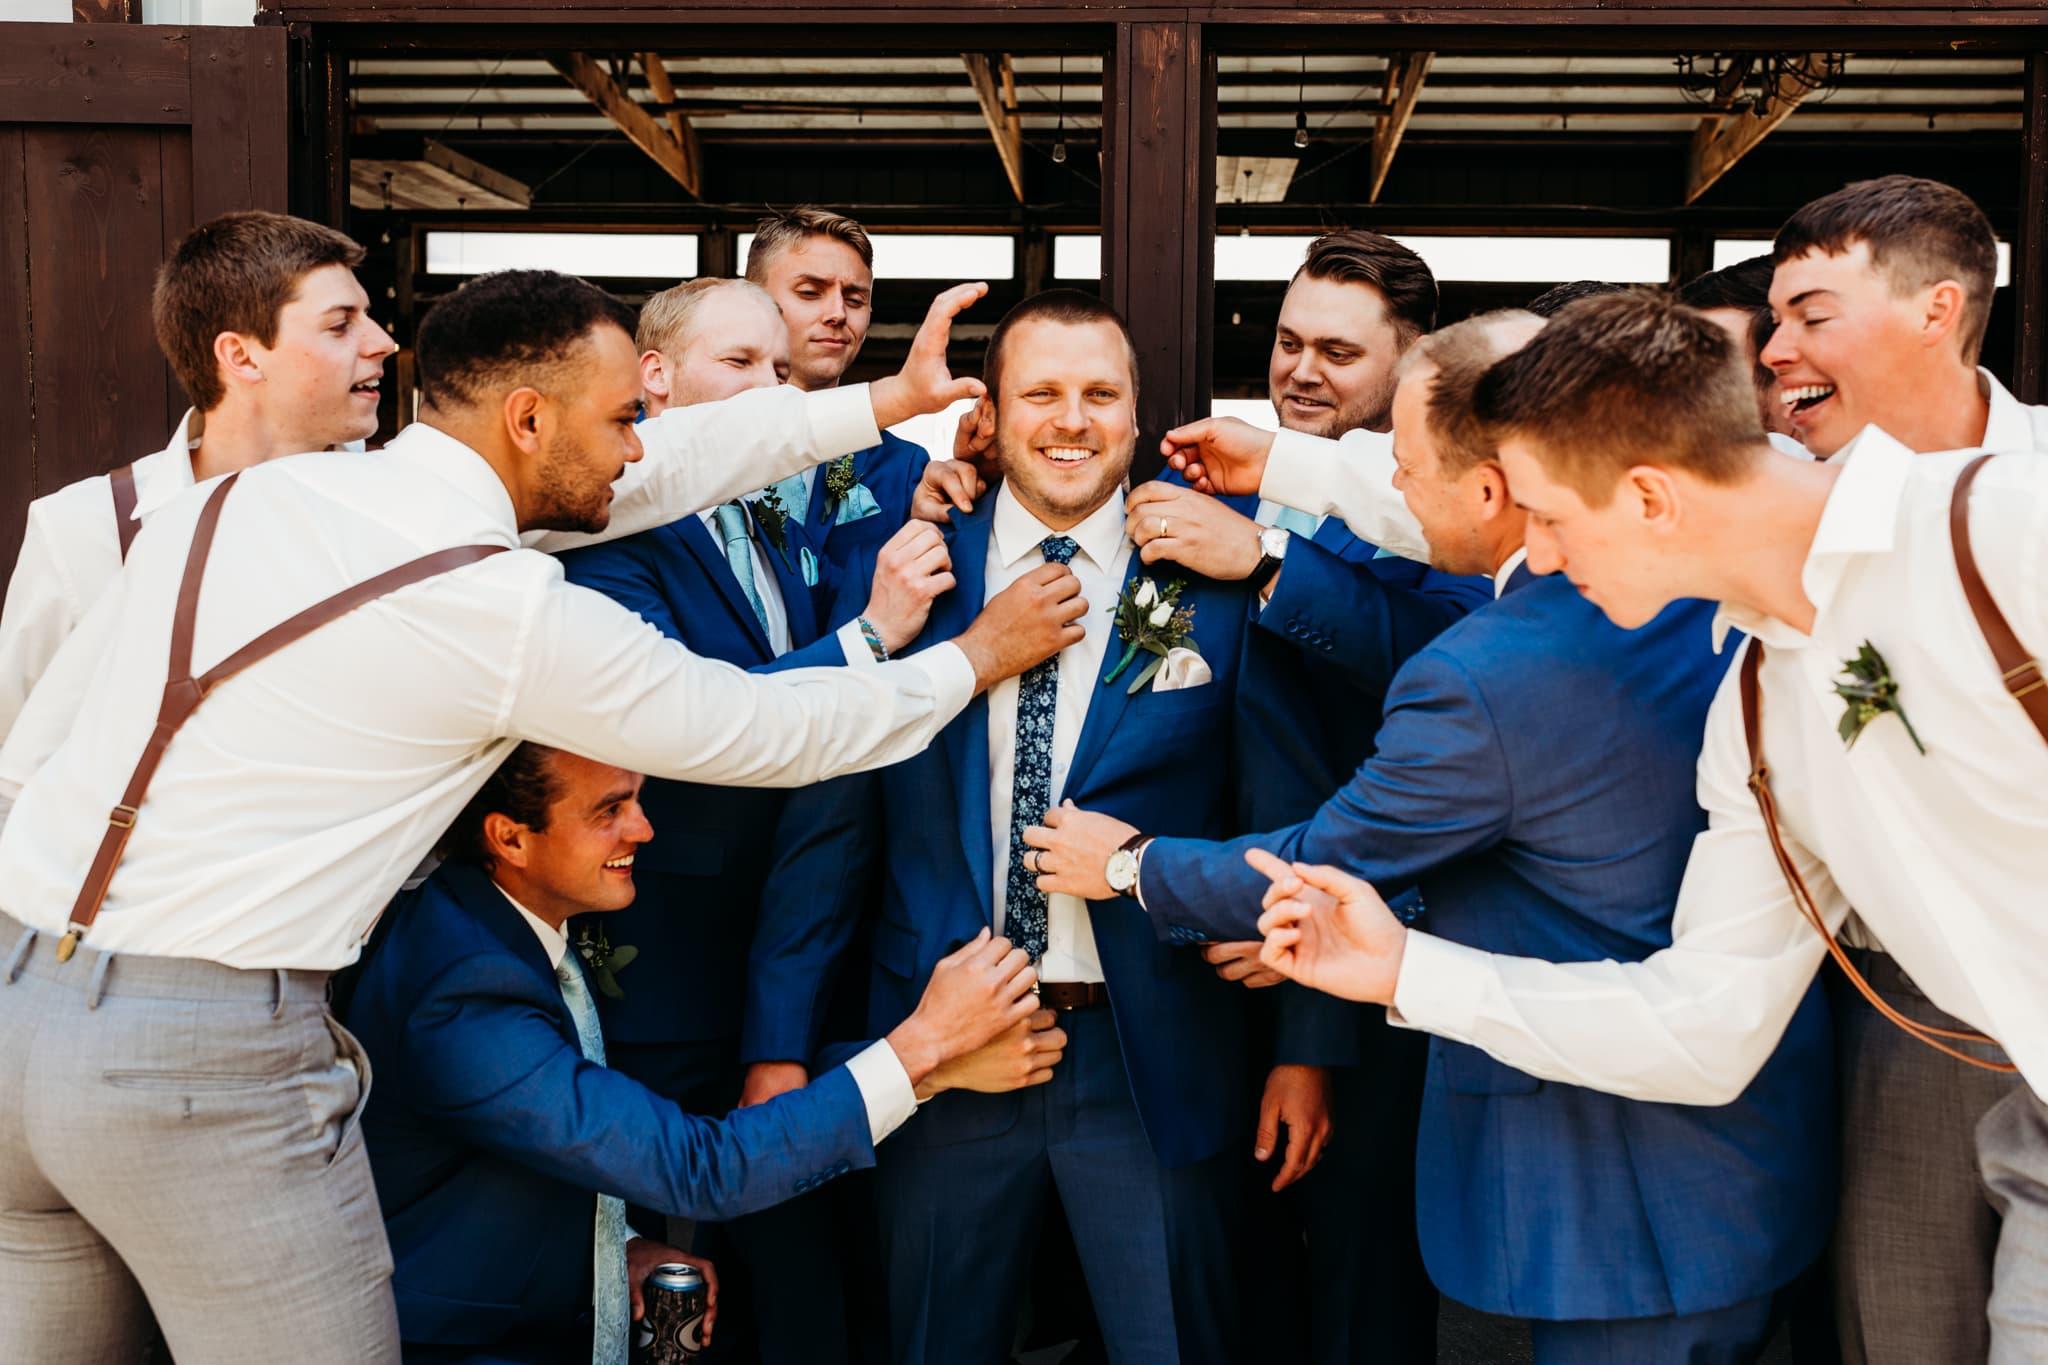 Groomsmen jokingly help the groom get ready at his schroeder farm wedding